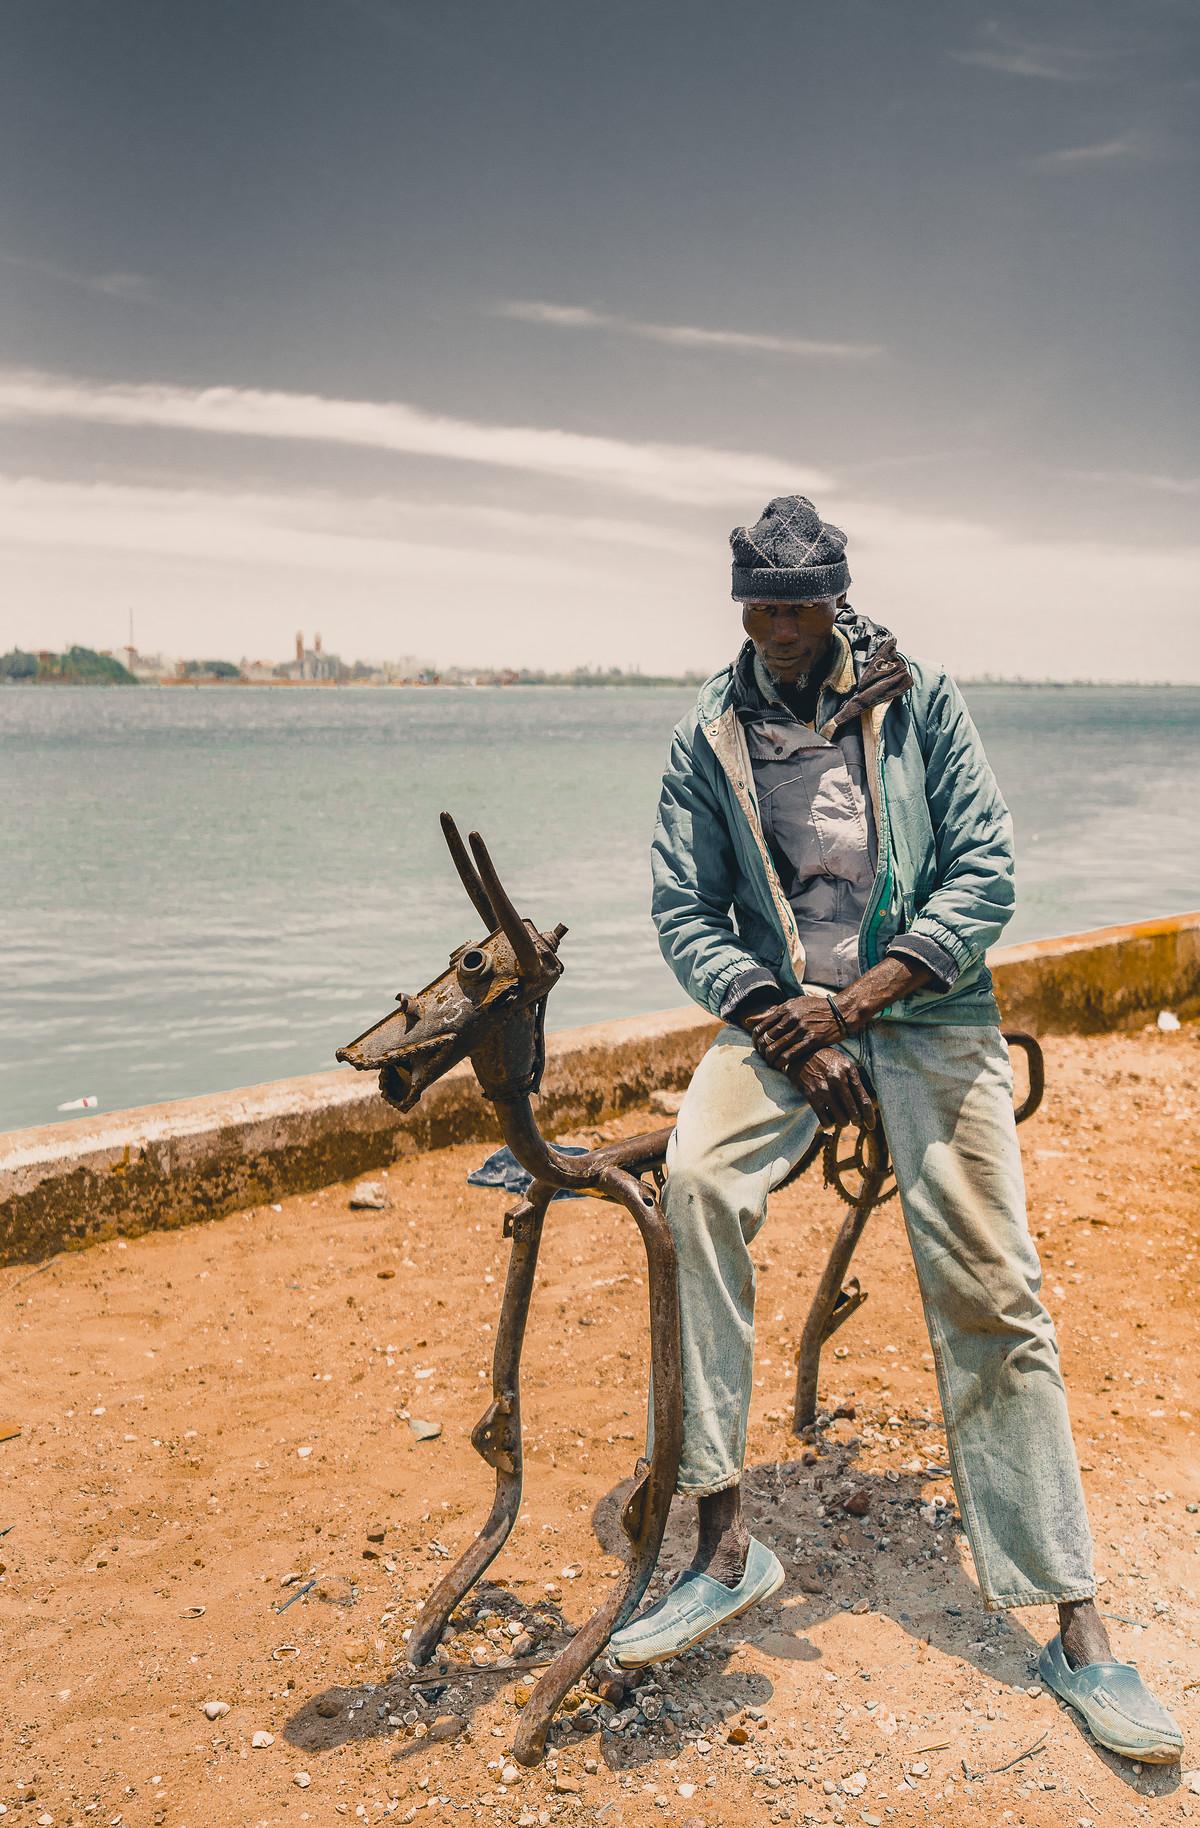 Metal rider, Senegal, Africa by SRIJAN NANDAN, Image Photography, Print on Paper,